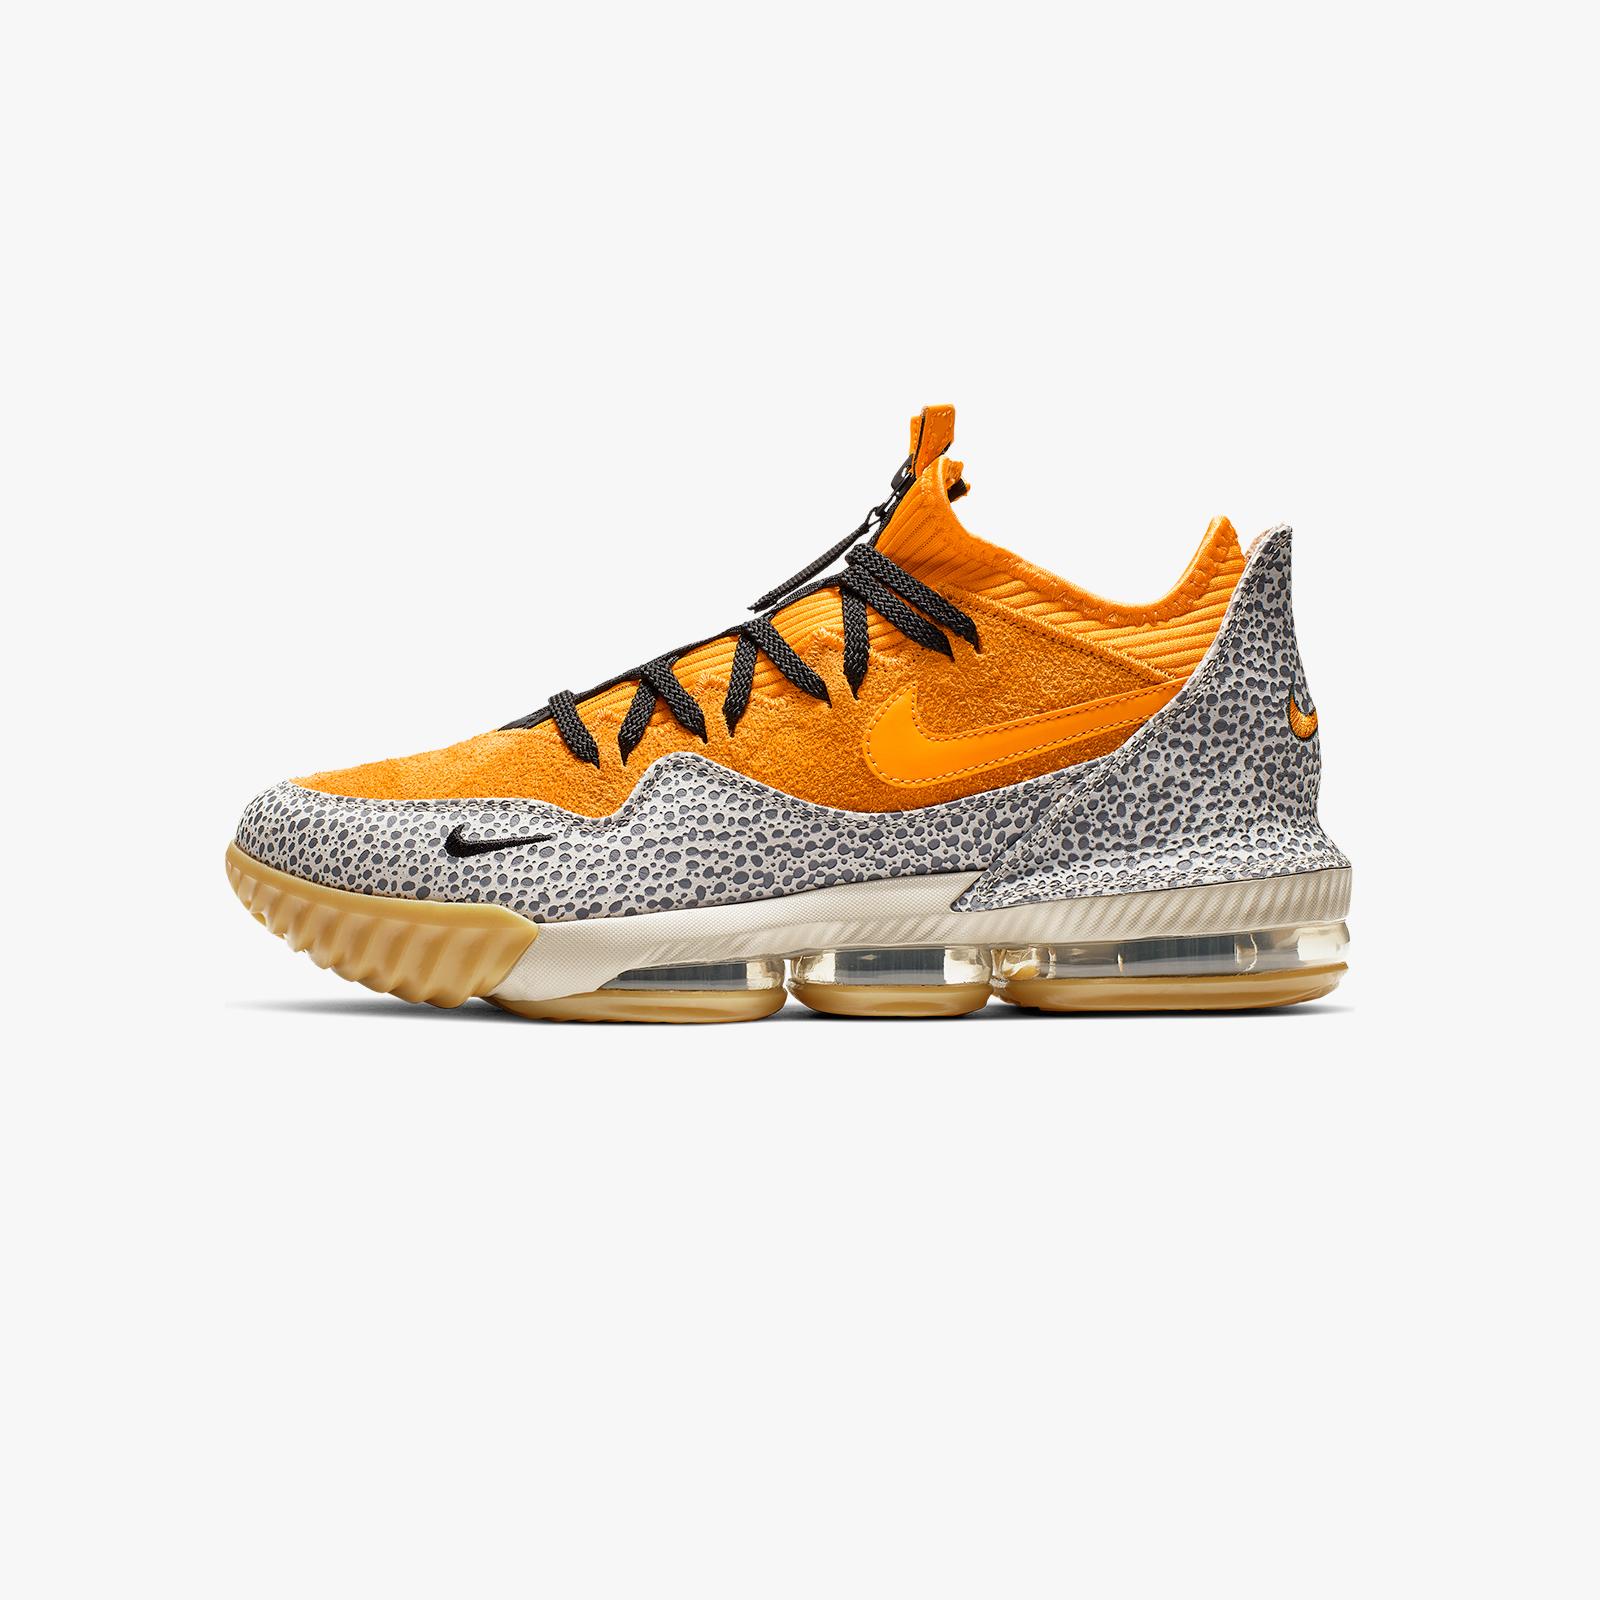 first rate 03a1f b5bd5 Nike LeBron XVI Low AC - Cd9471-800 - Sneakersnstuff   sneakers ...